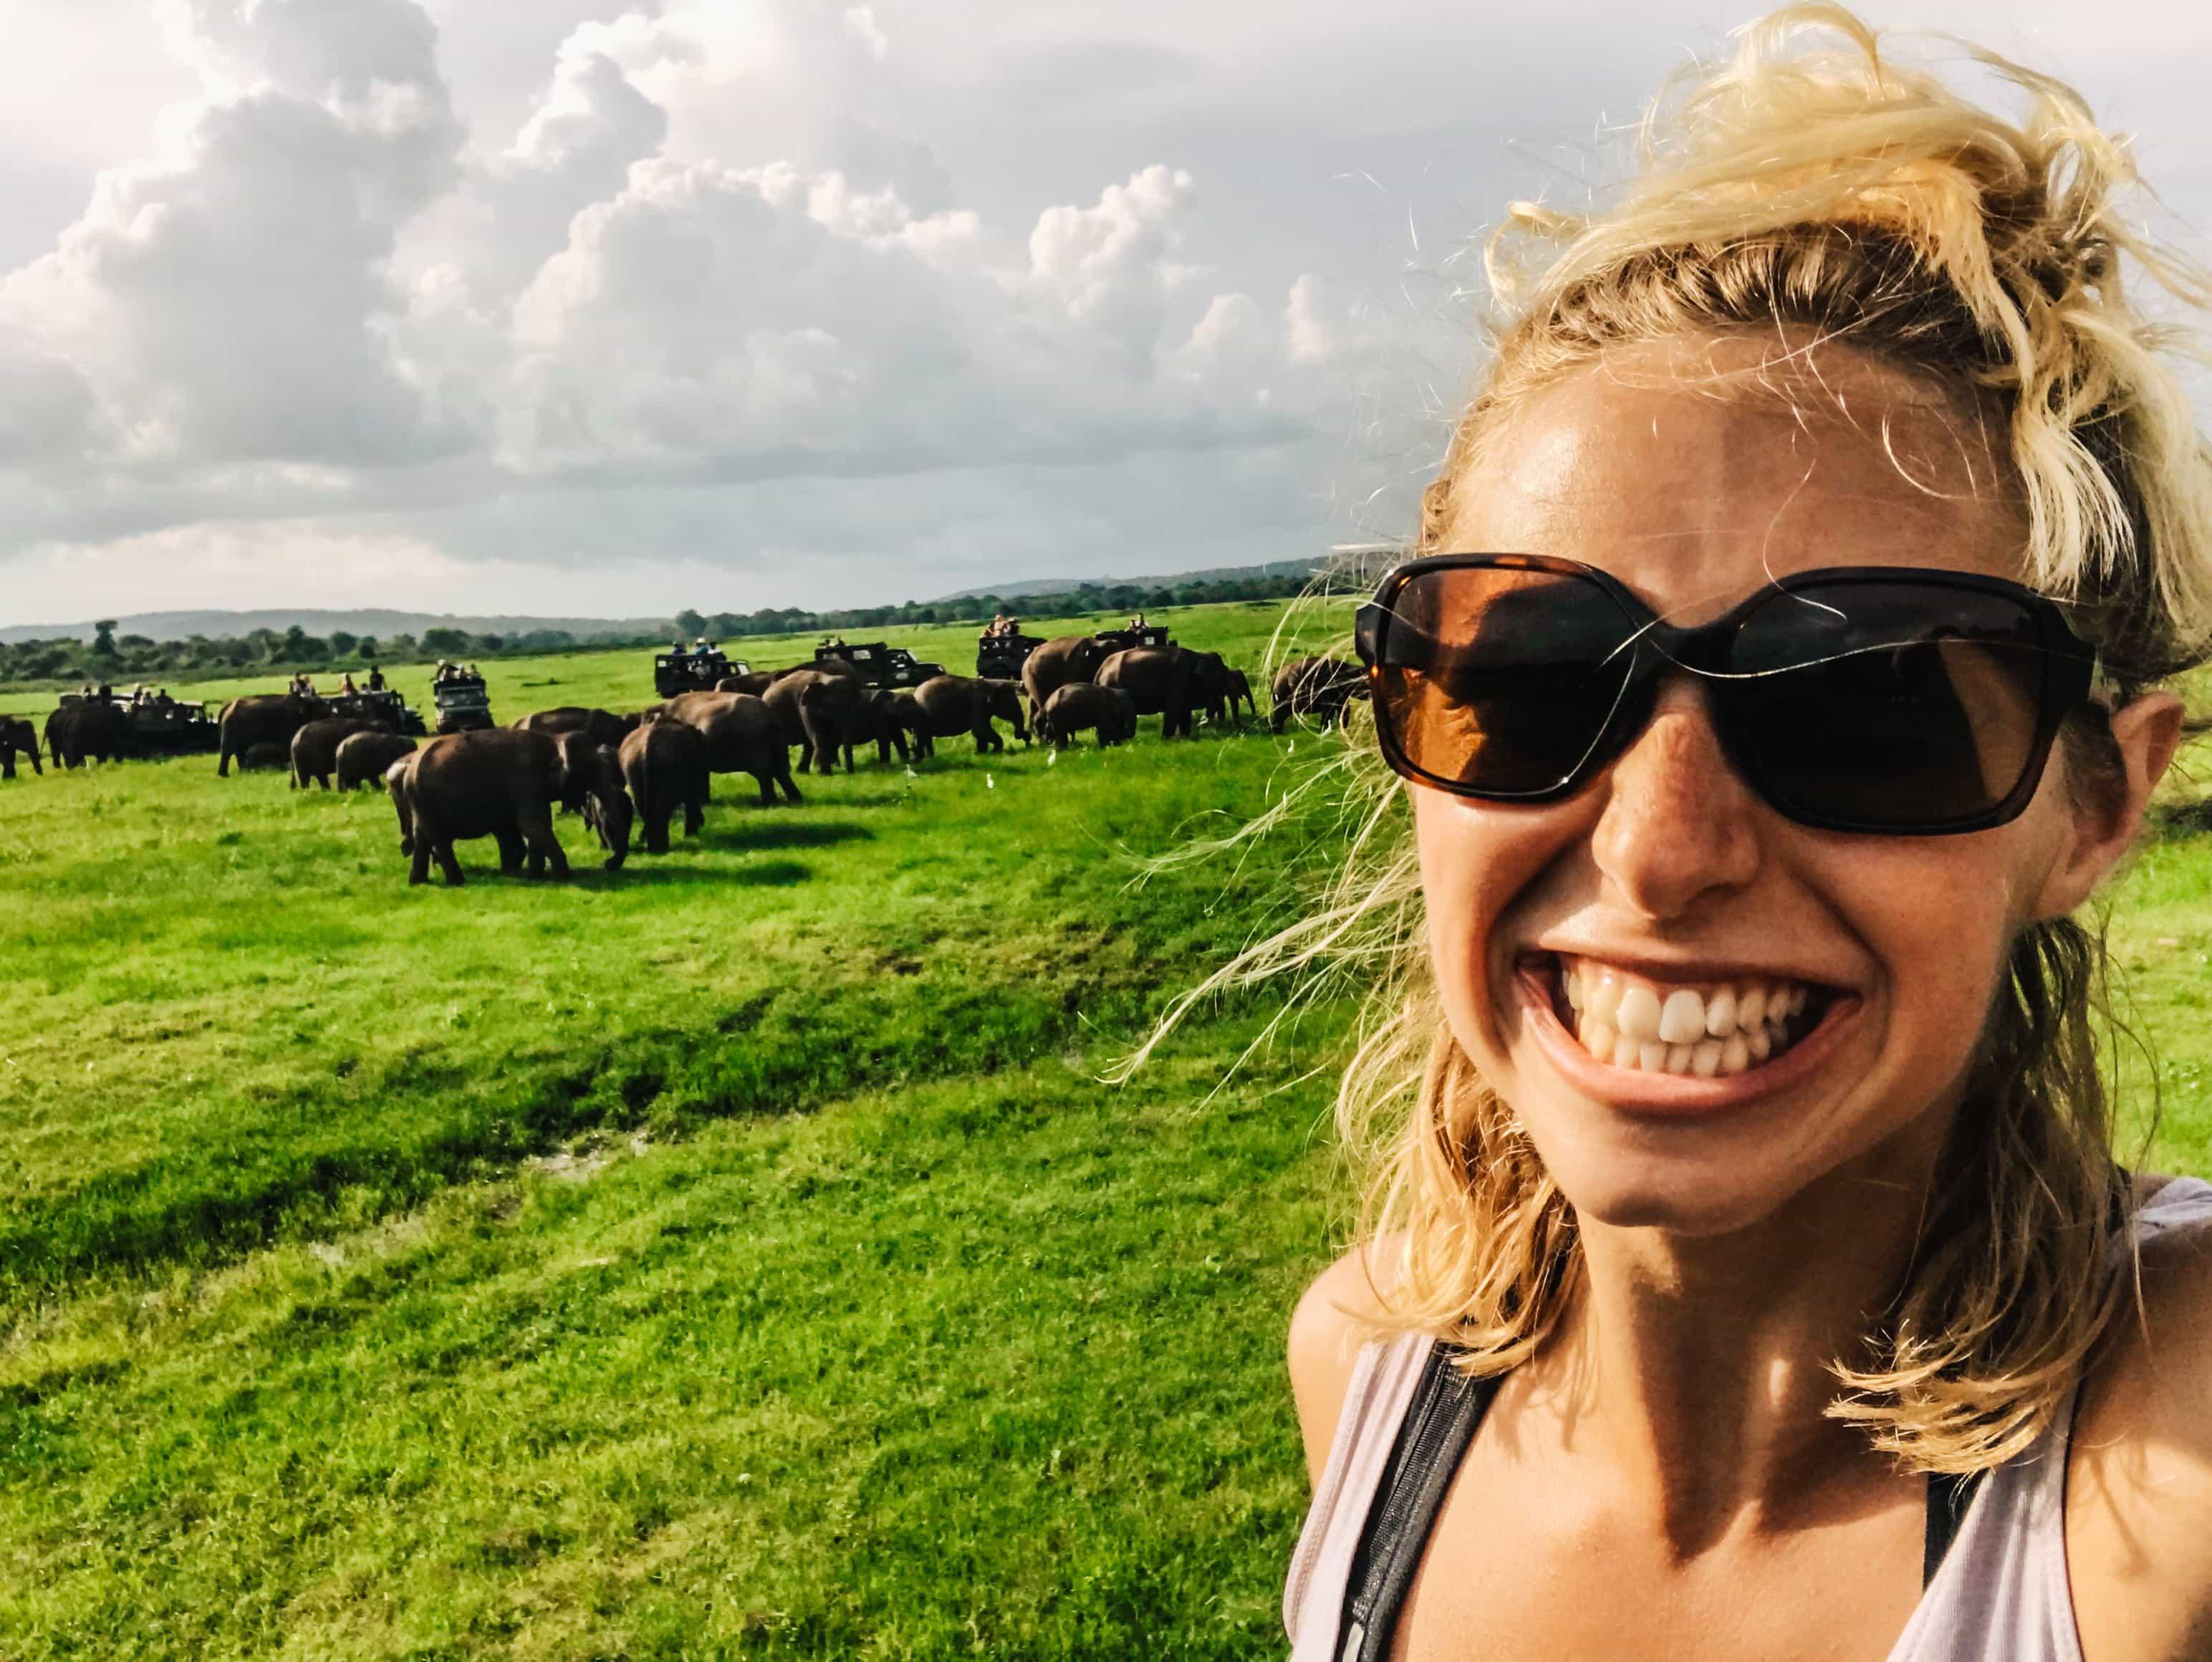 Elephant Safari in Kaudulla National Park with Lakpura Travels